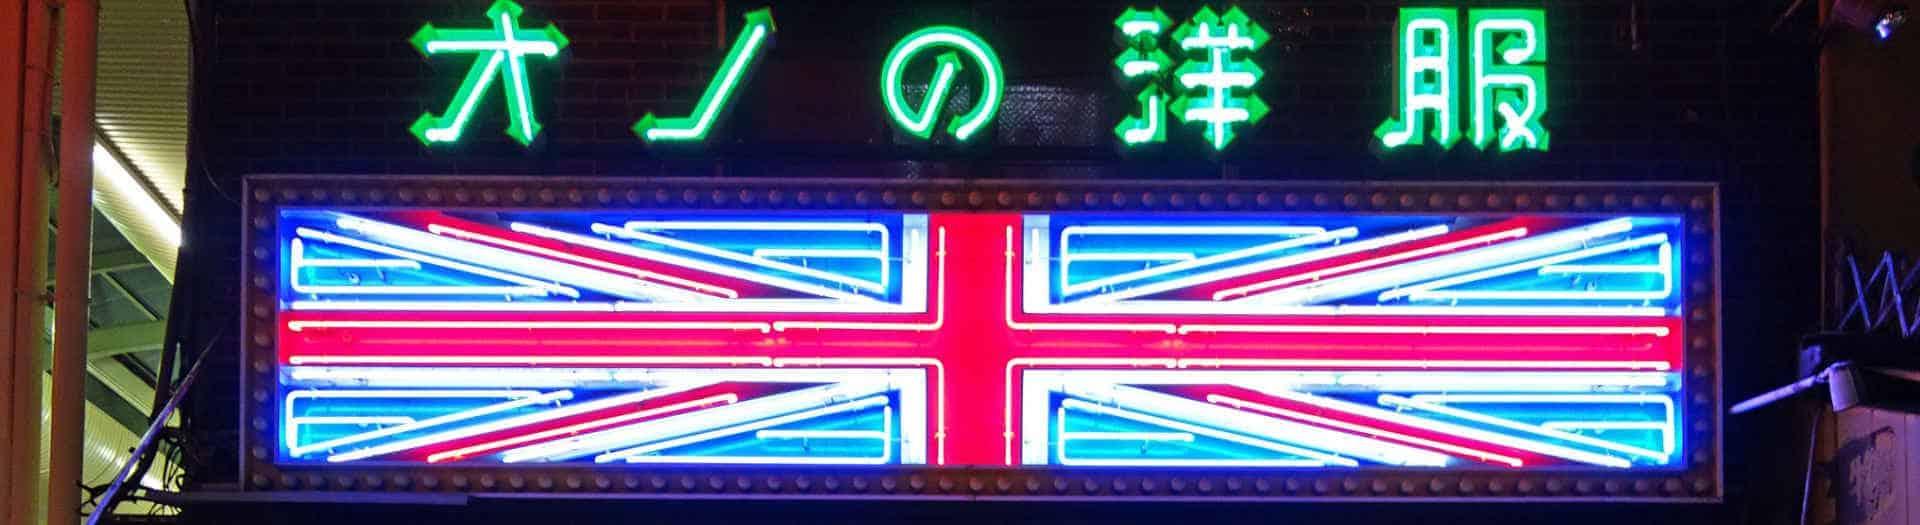 Union Jack Blog header - Union Jack - Hoisted by its own petard.